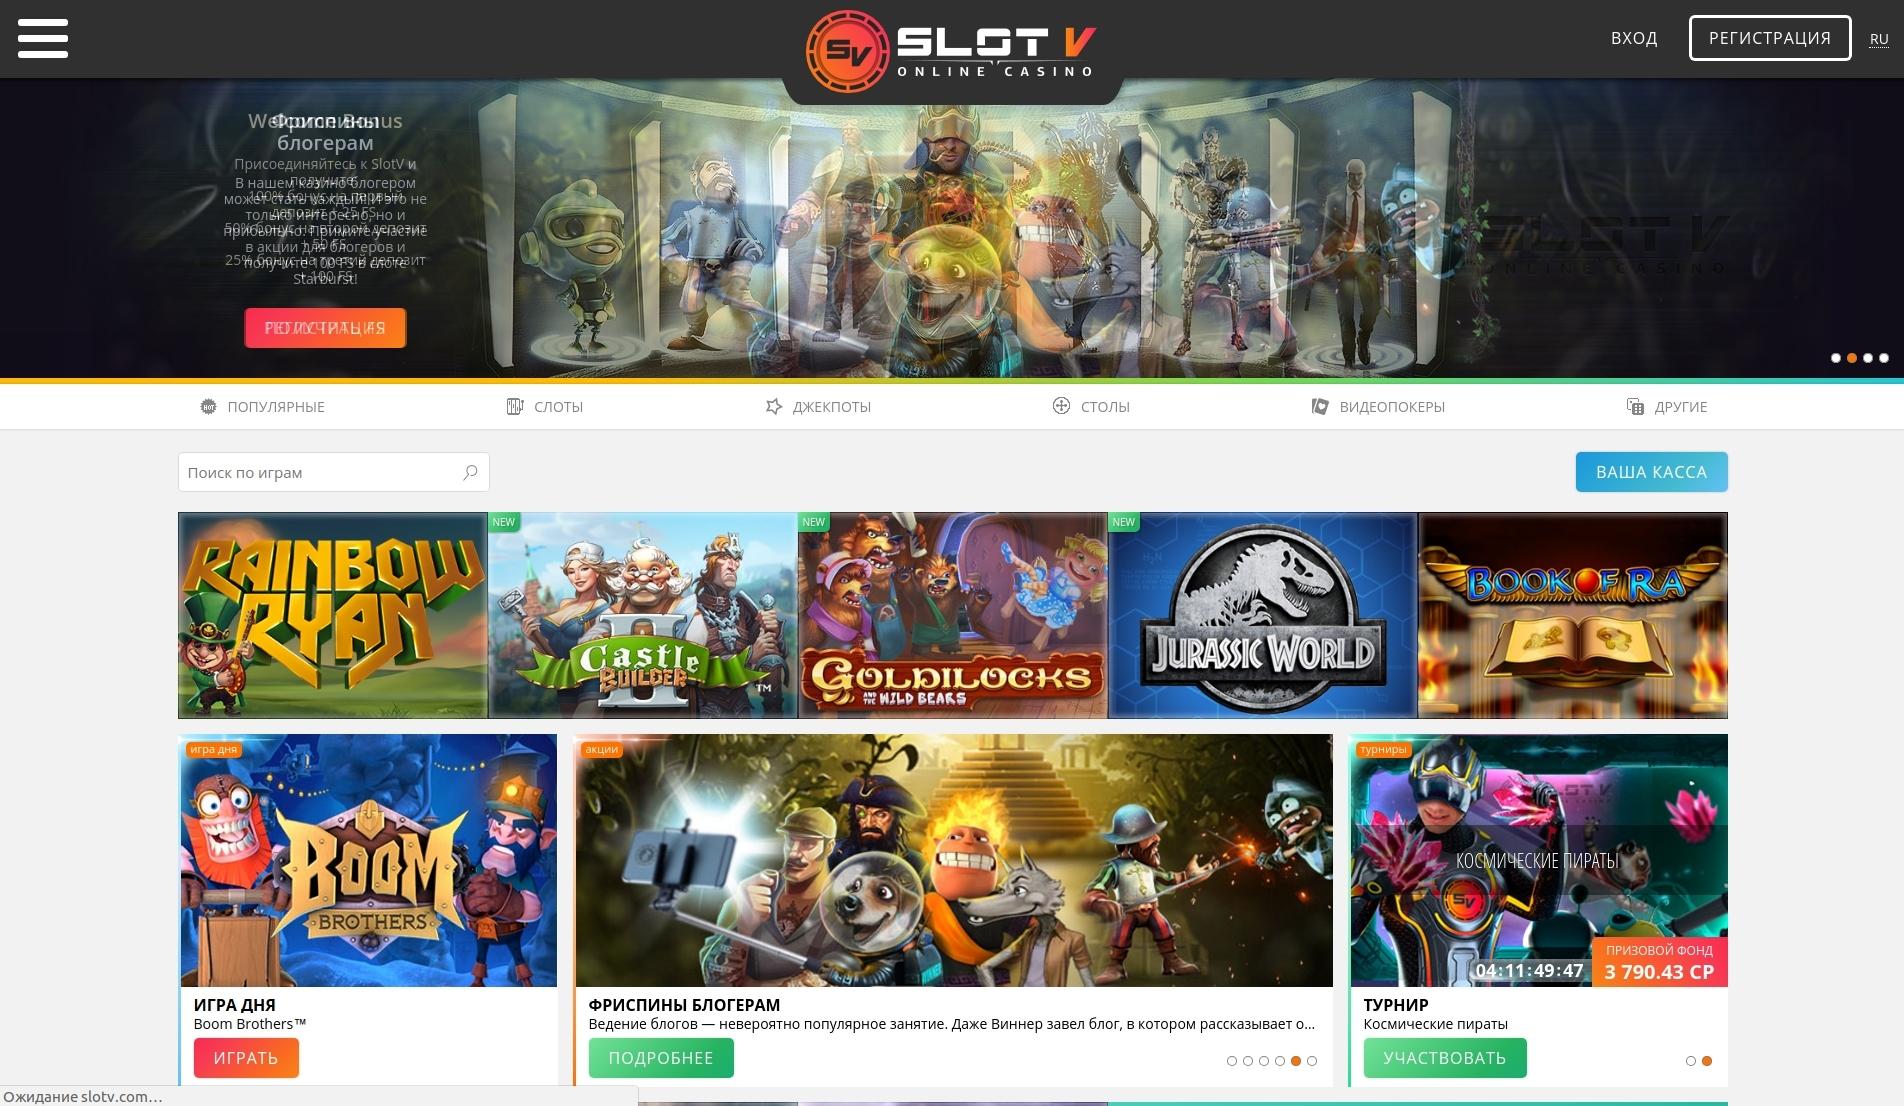 официальный сайт онлайн казино slotv зеркало сайта